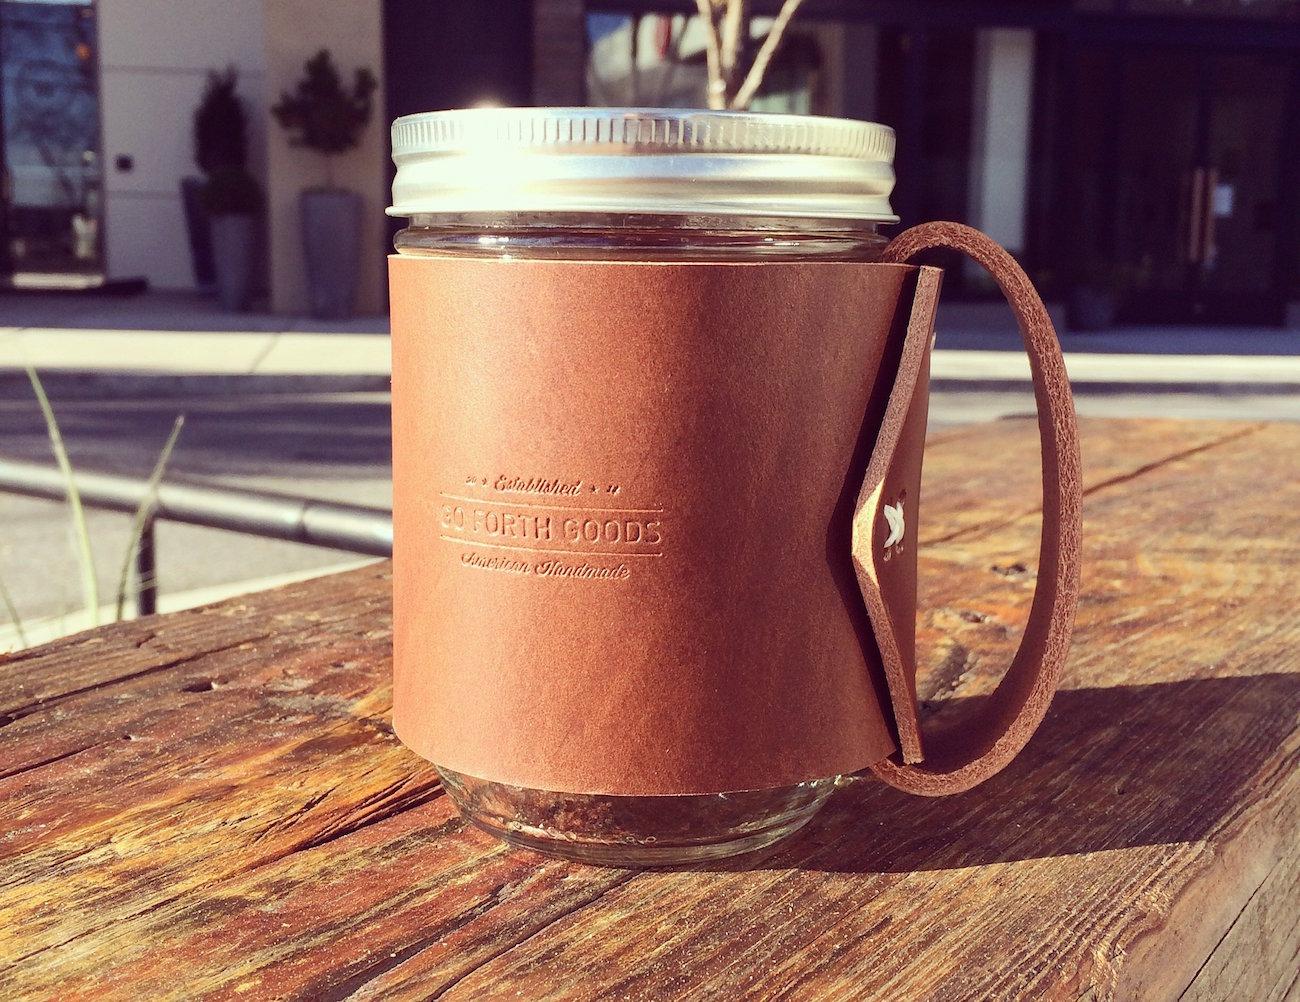 the-traveler-mug-mason-jar-hugged-in-vegetable-tanned-leather-04